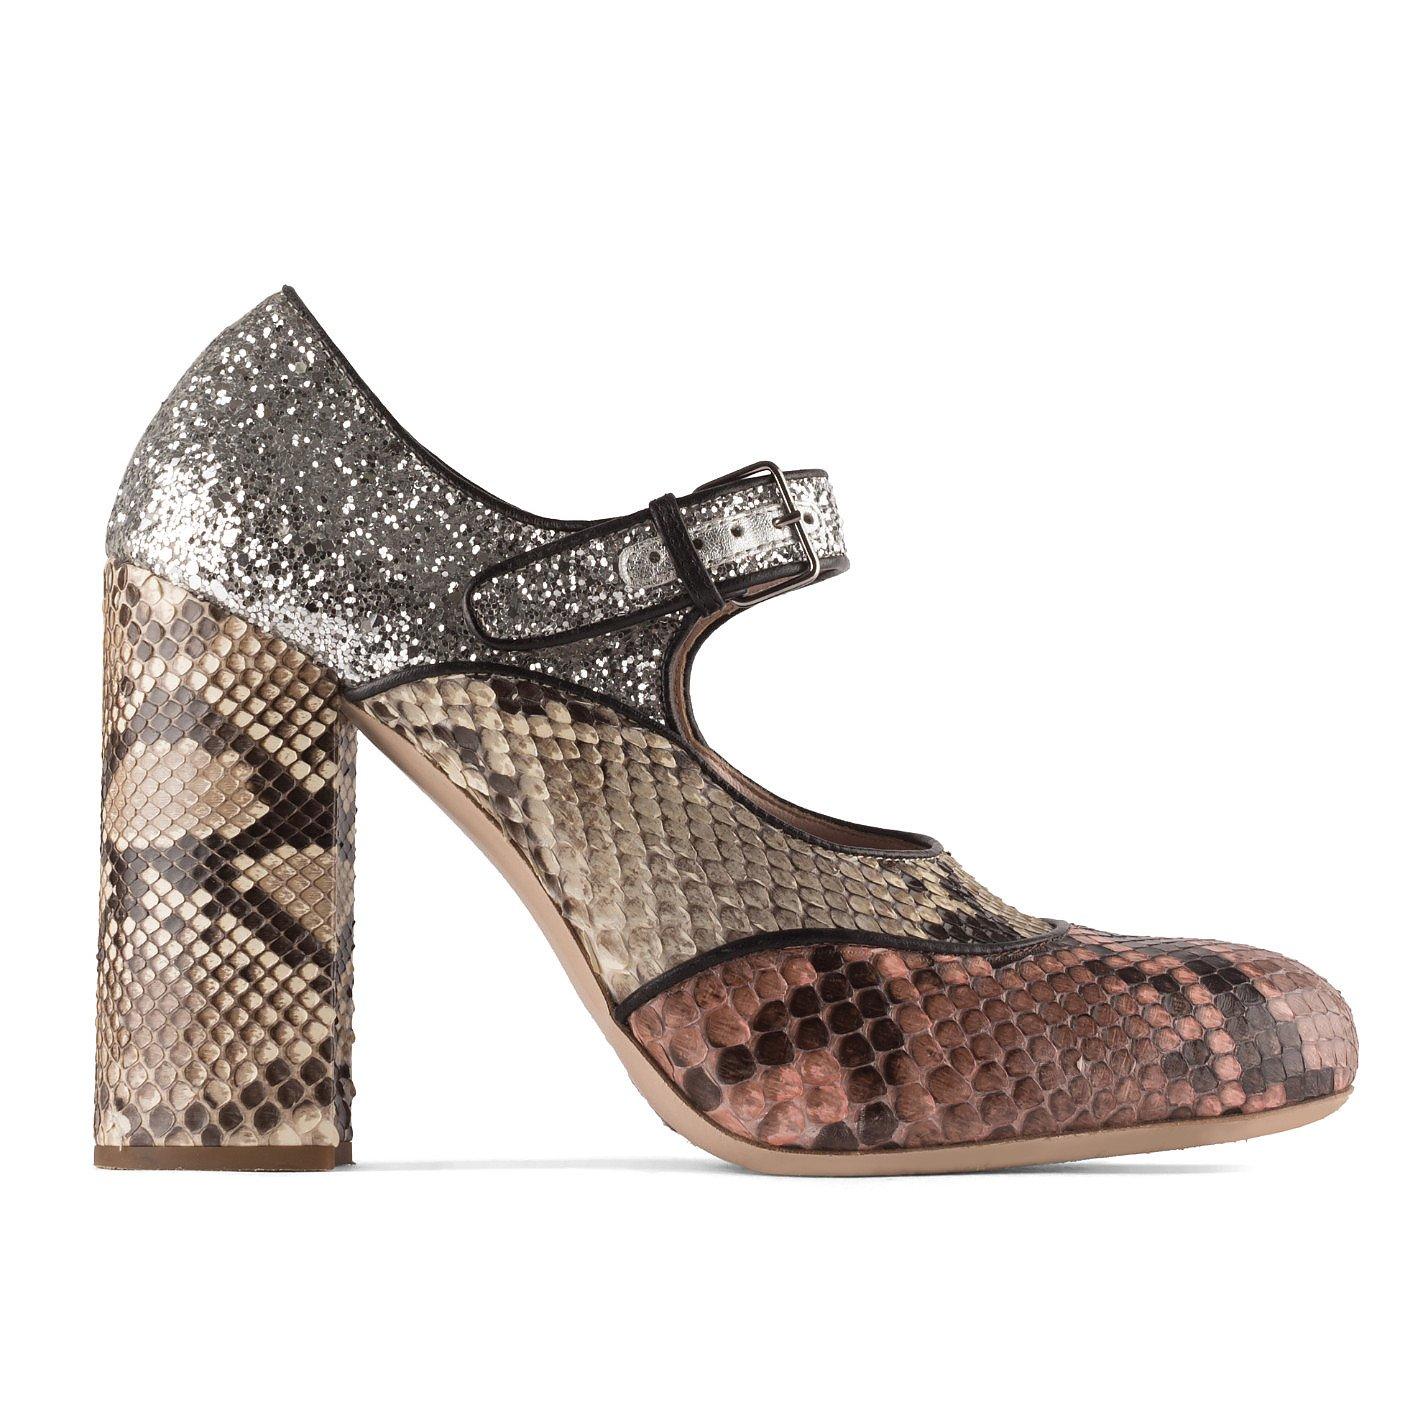 Miu Miu Snakeskin and Glitter Shoes